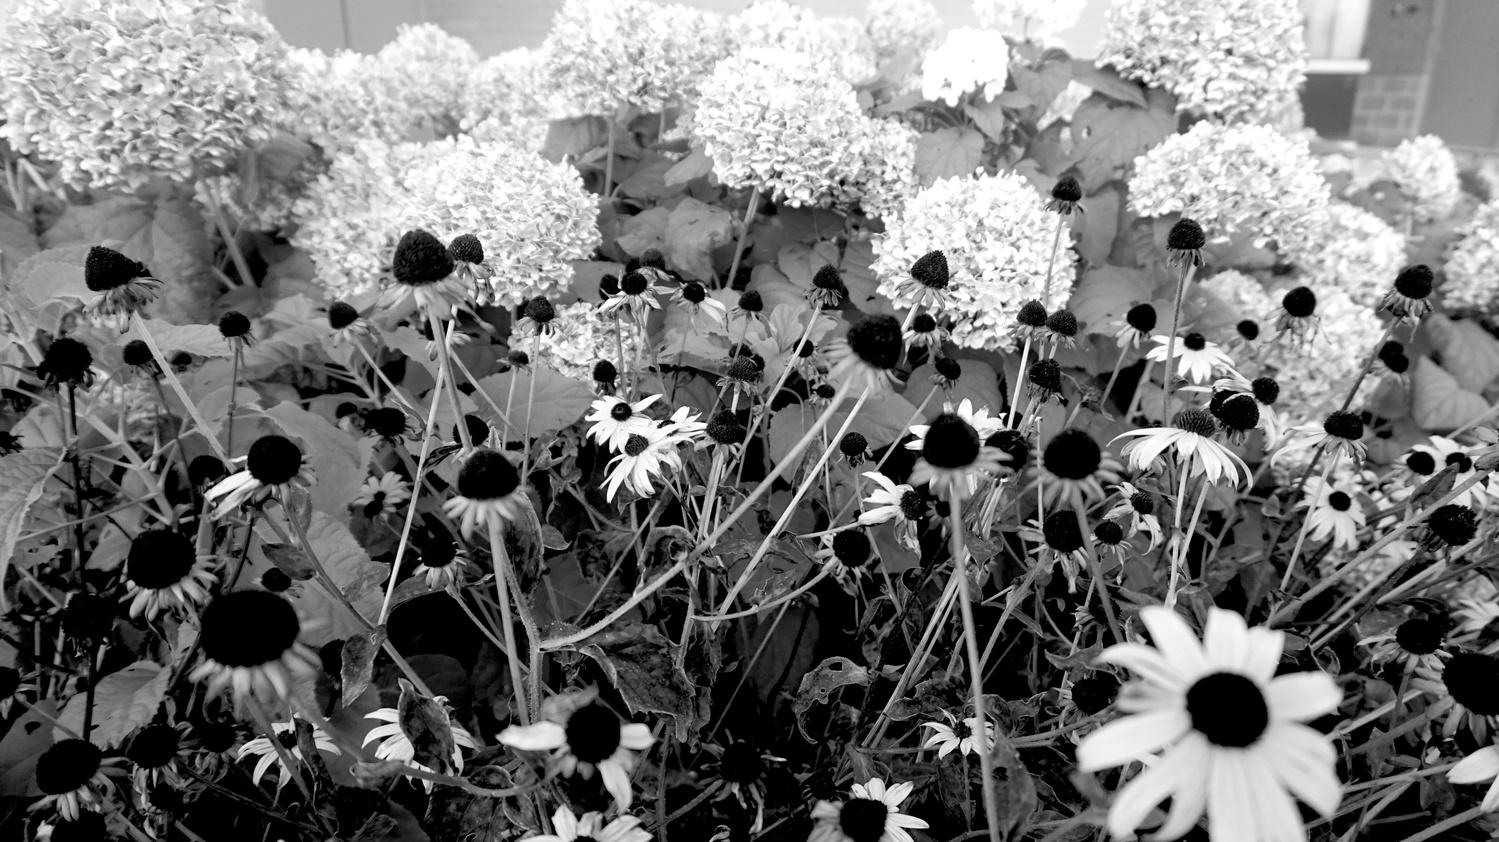 Flower Party by Natalia Sadowski